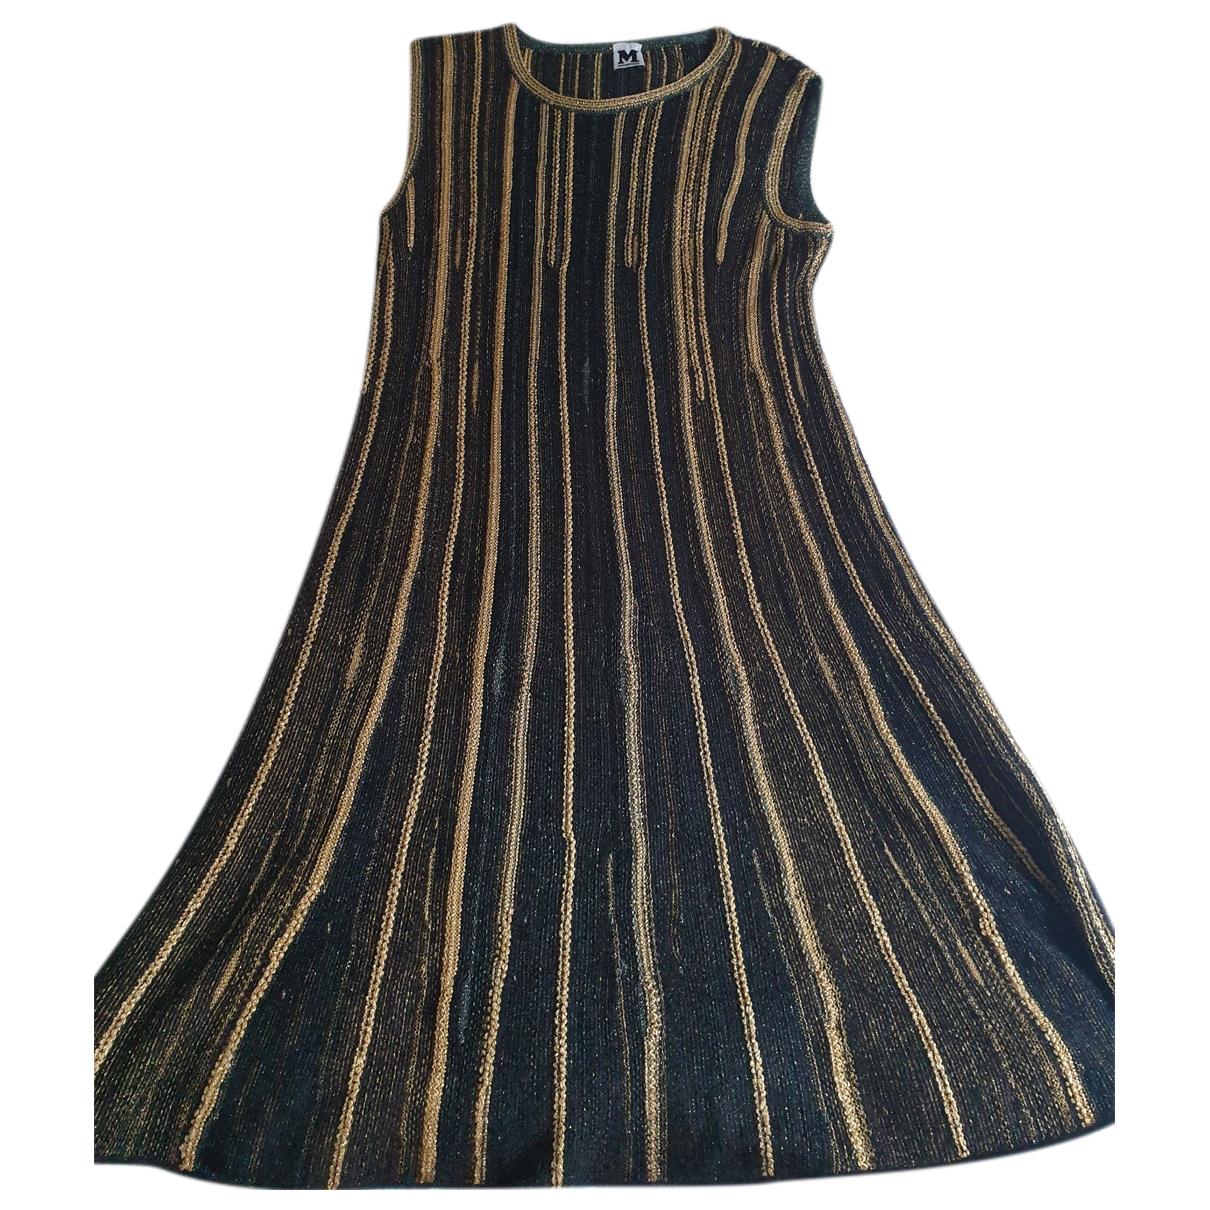 M Missoni \N Multicolour Wool dress for Women One Size FR